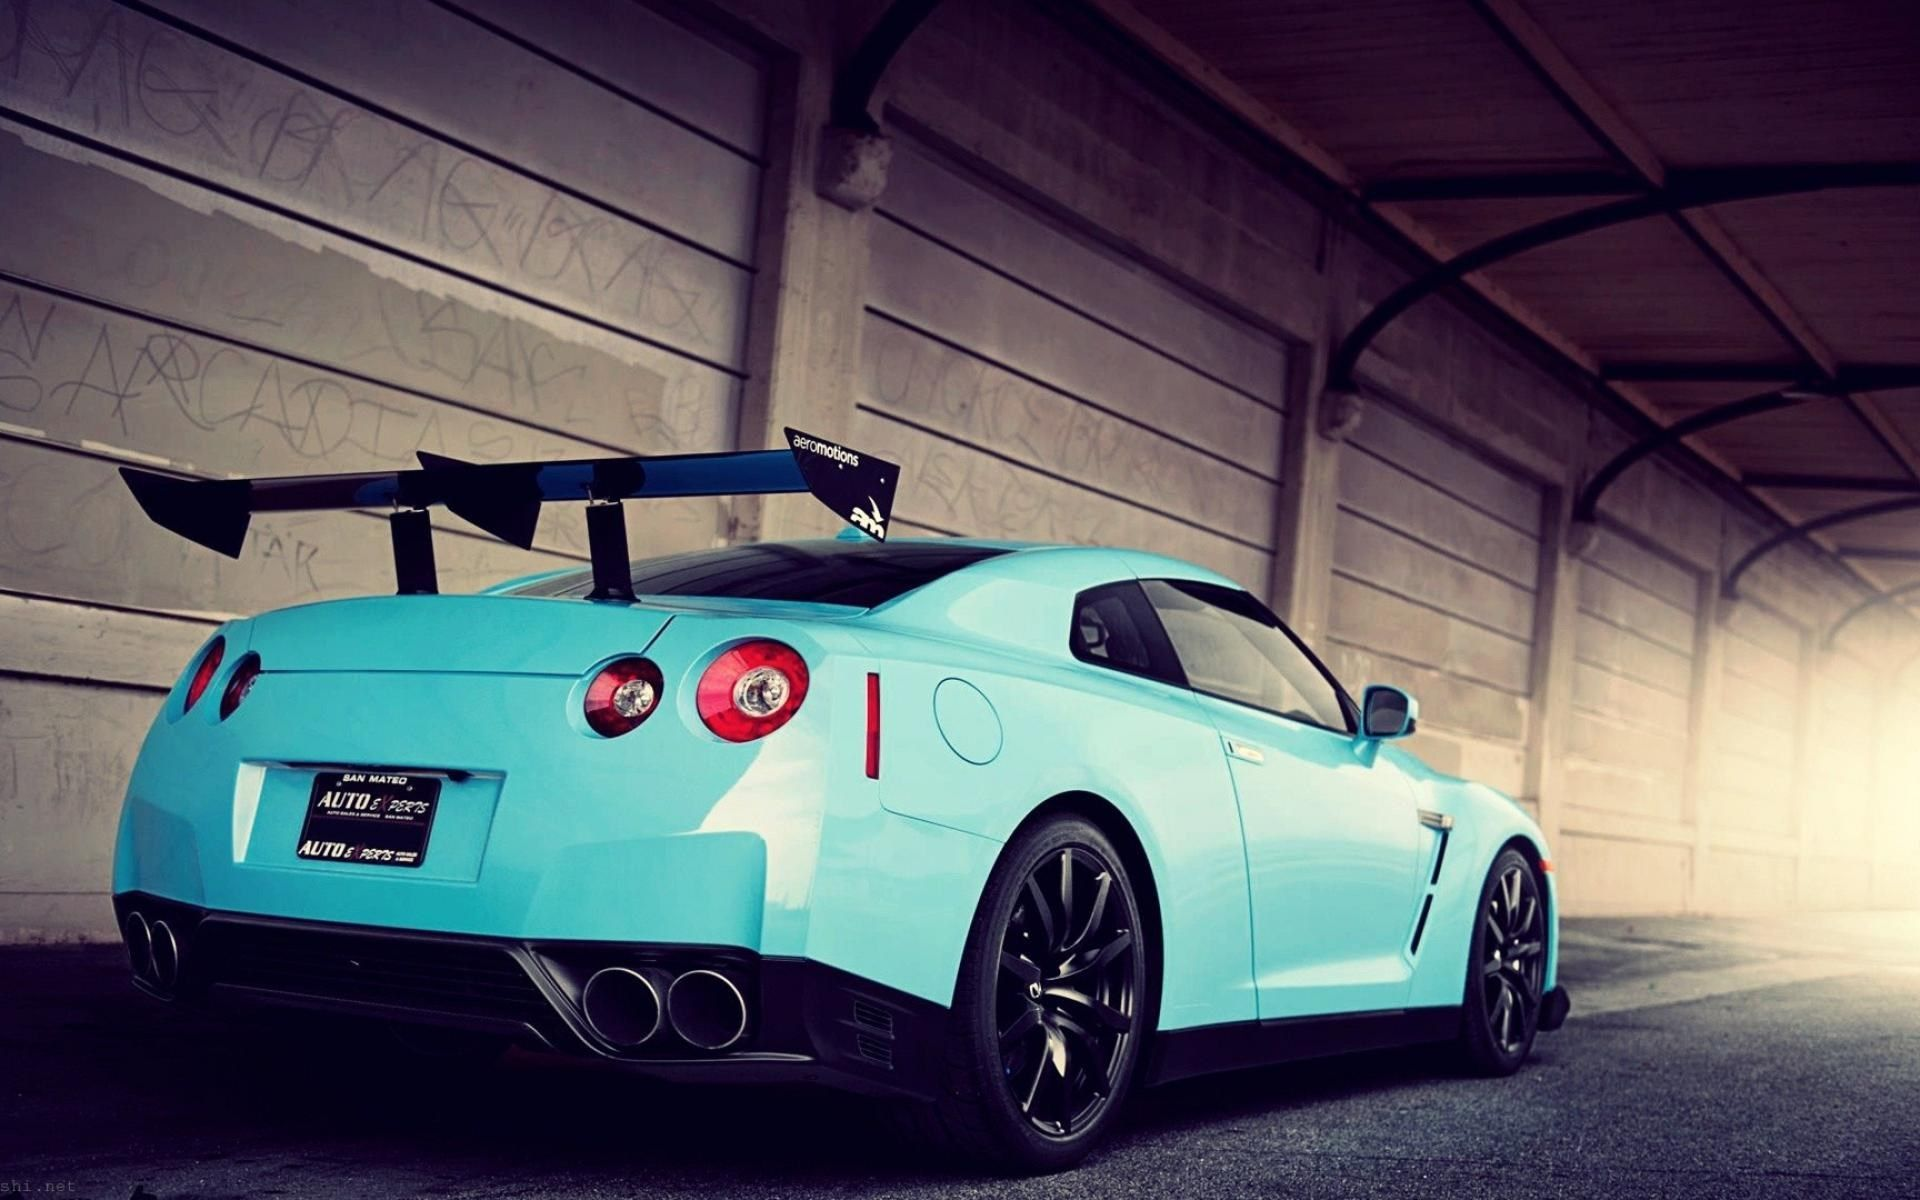 "1920x1200 images nissan gtr wallpaper hd2643 with nissan gtr wallpaper hd2643 ...""> Download · 3648x2052 Beautiful Blue Nissan Gtr Wallpaper"